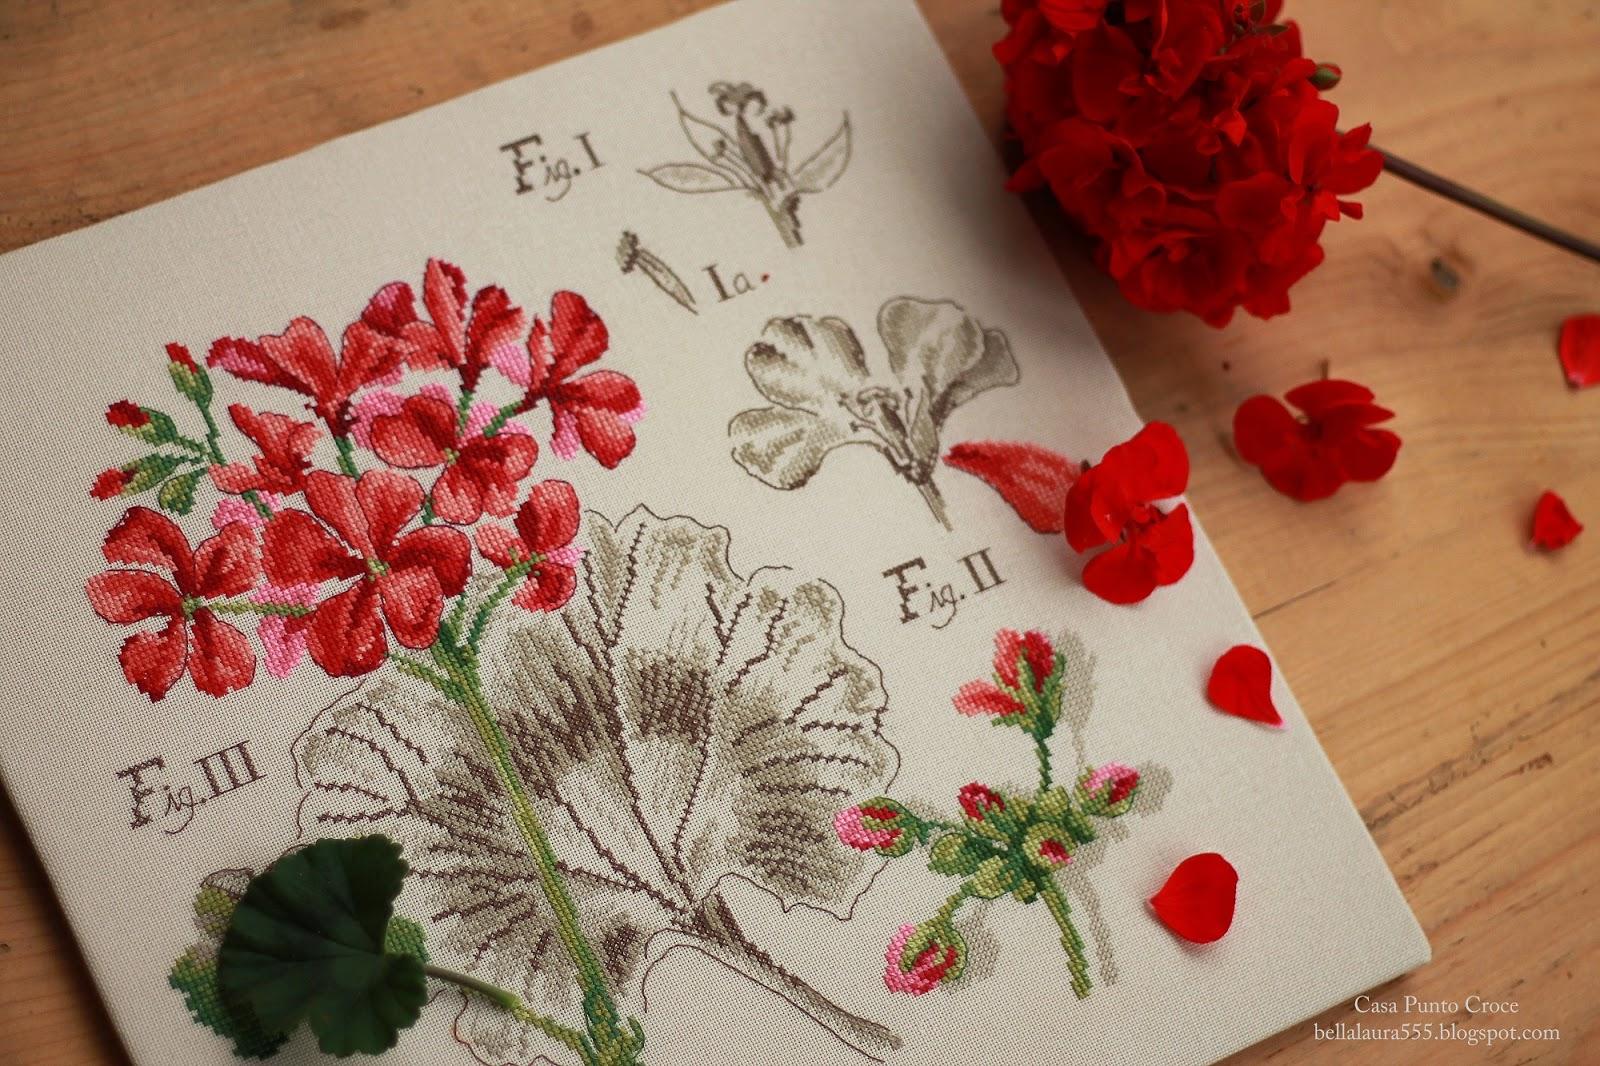 http://bellalaura555.blogspot.ru/2014/07/blog-post_9.html